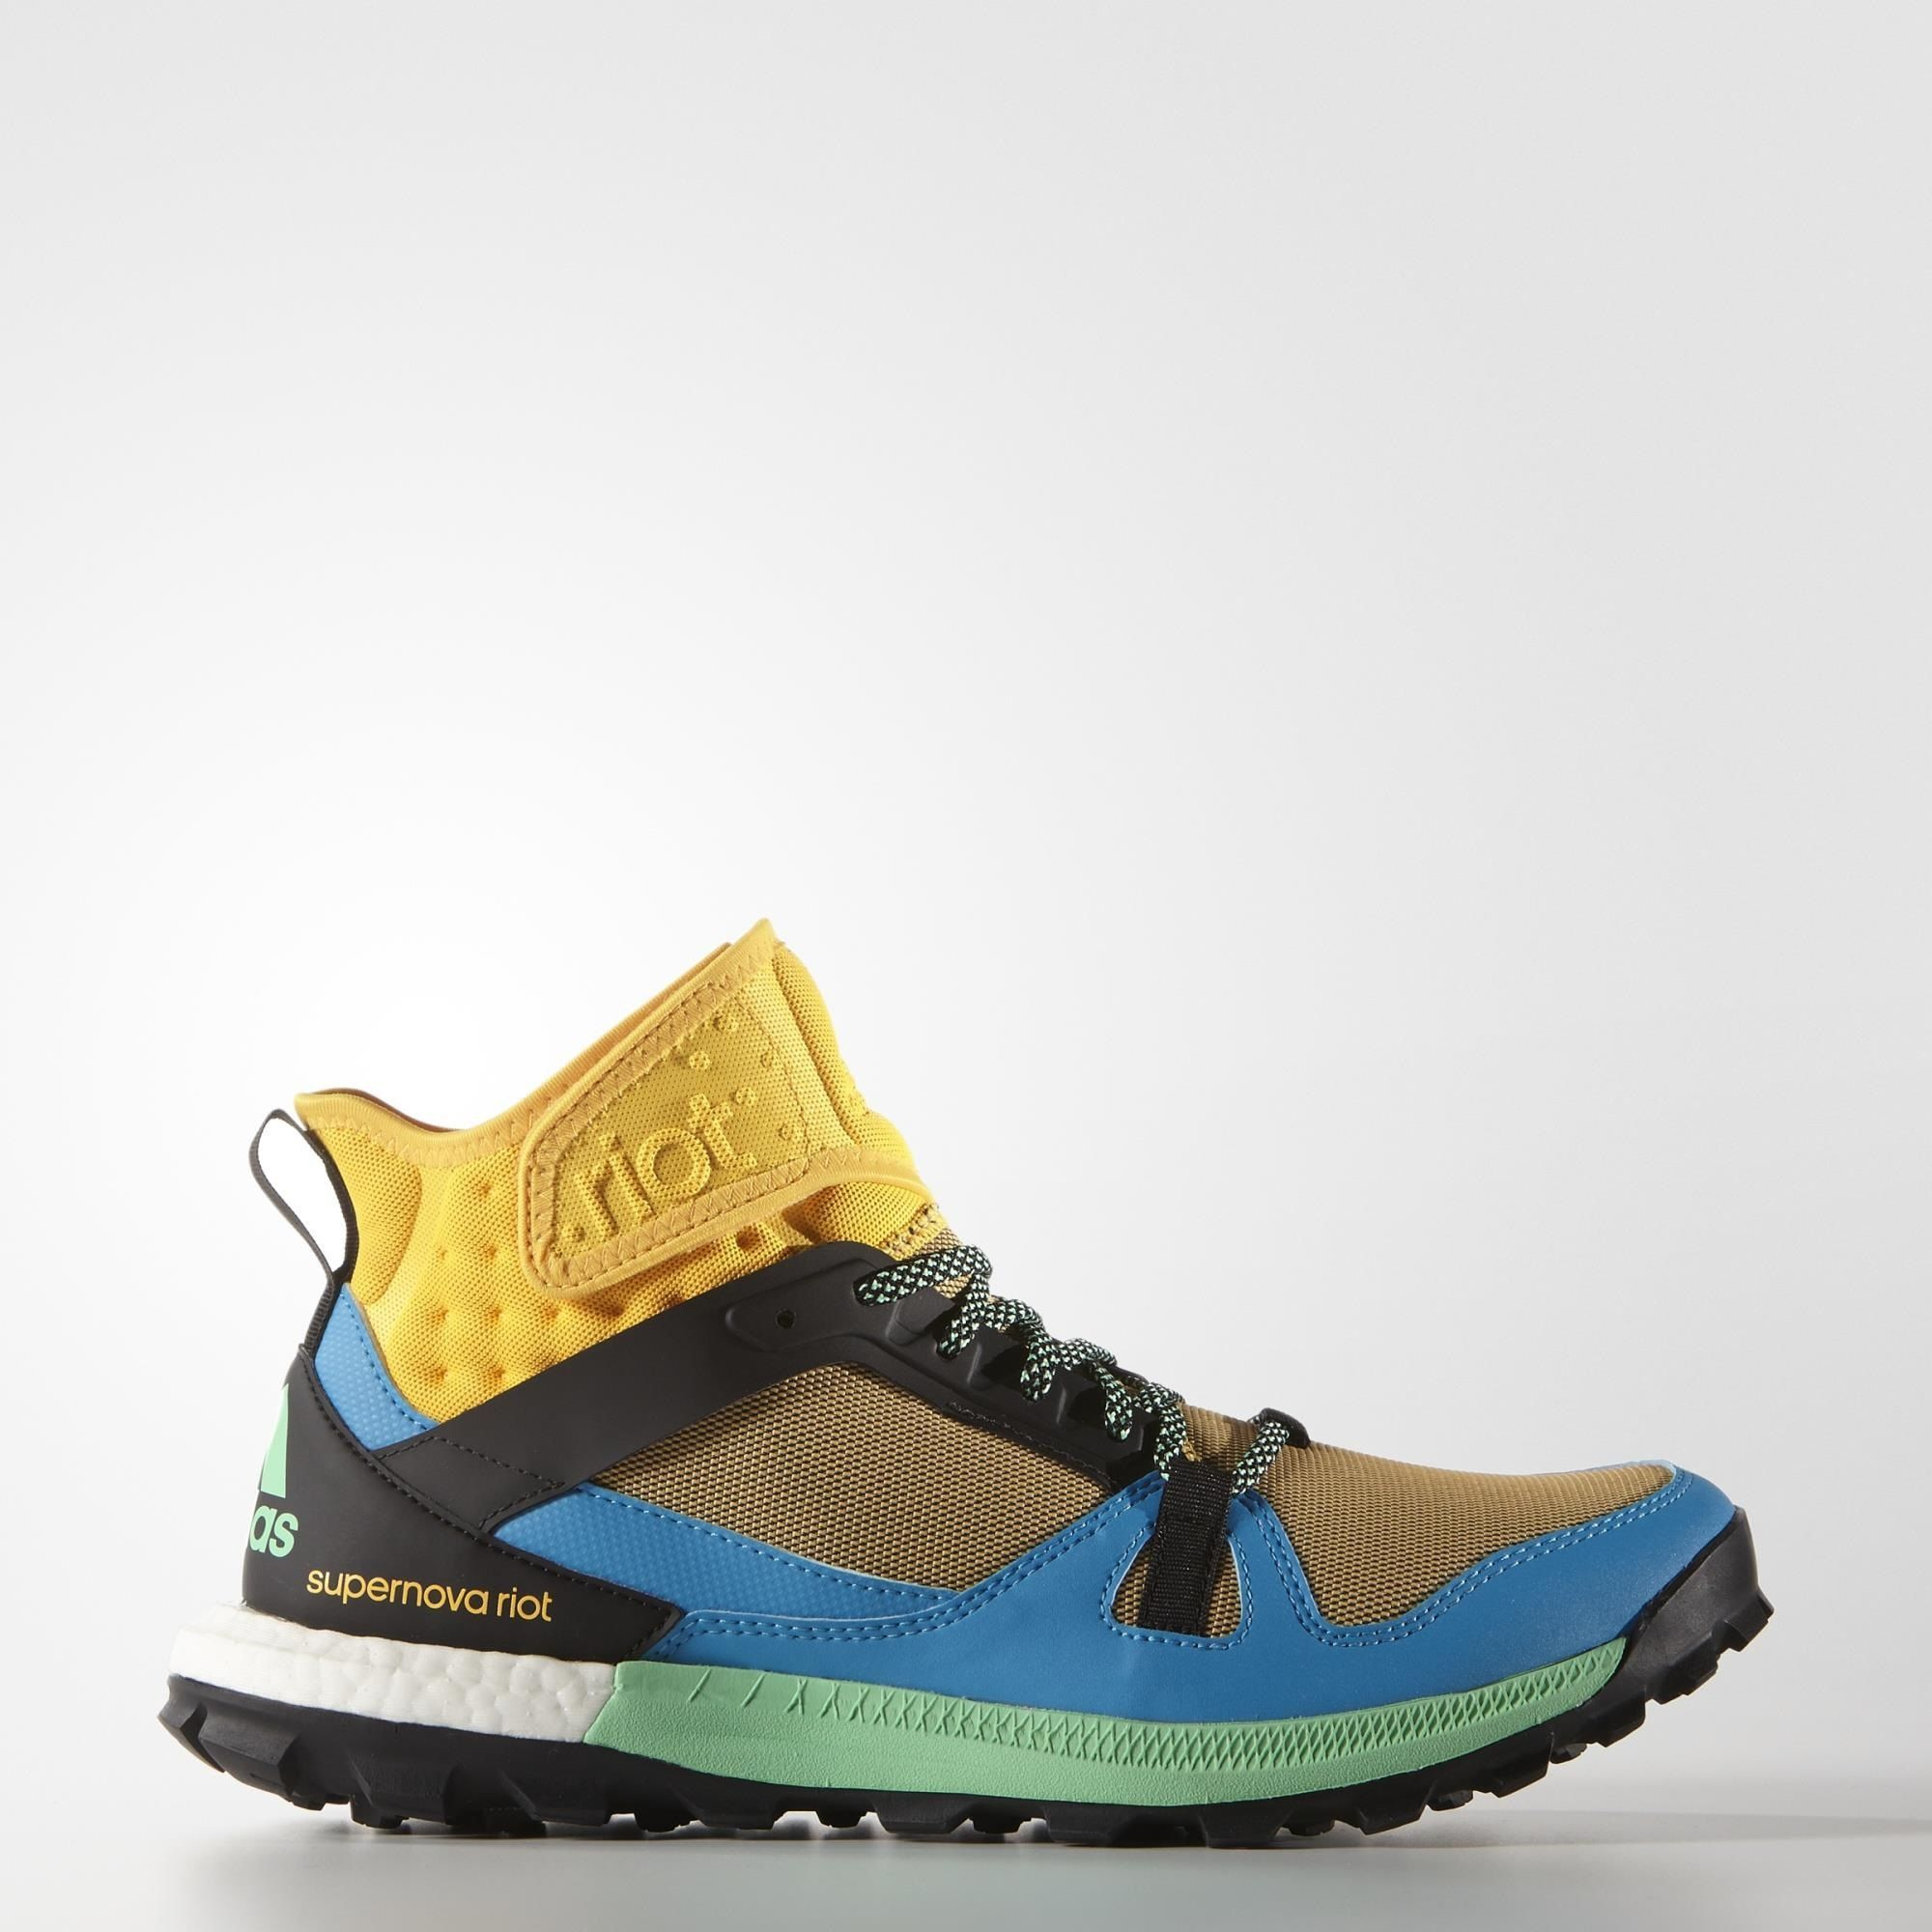 Adidas supernova rivolta m sportgoods design pinterest adidas